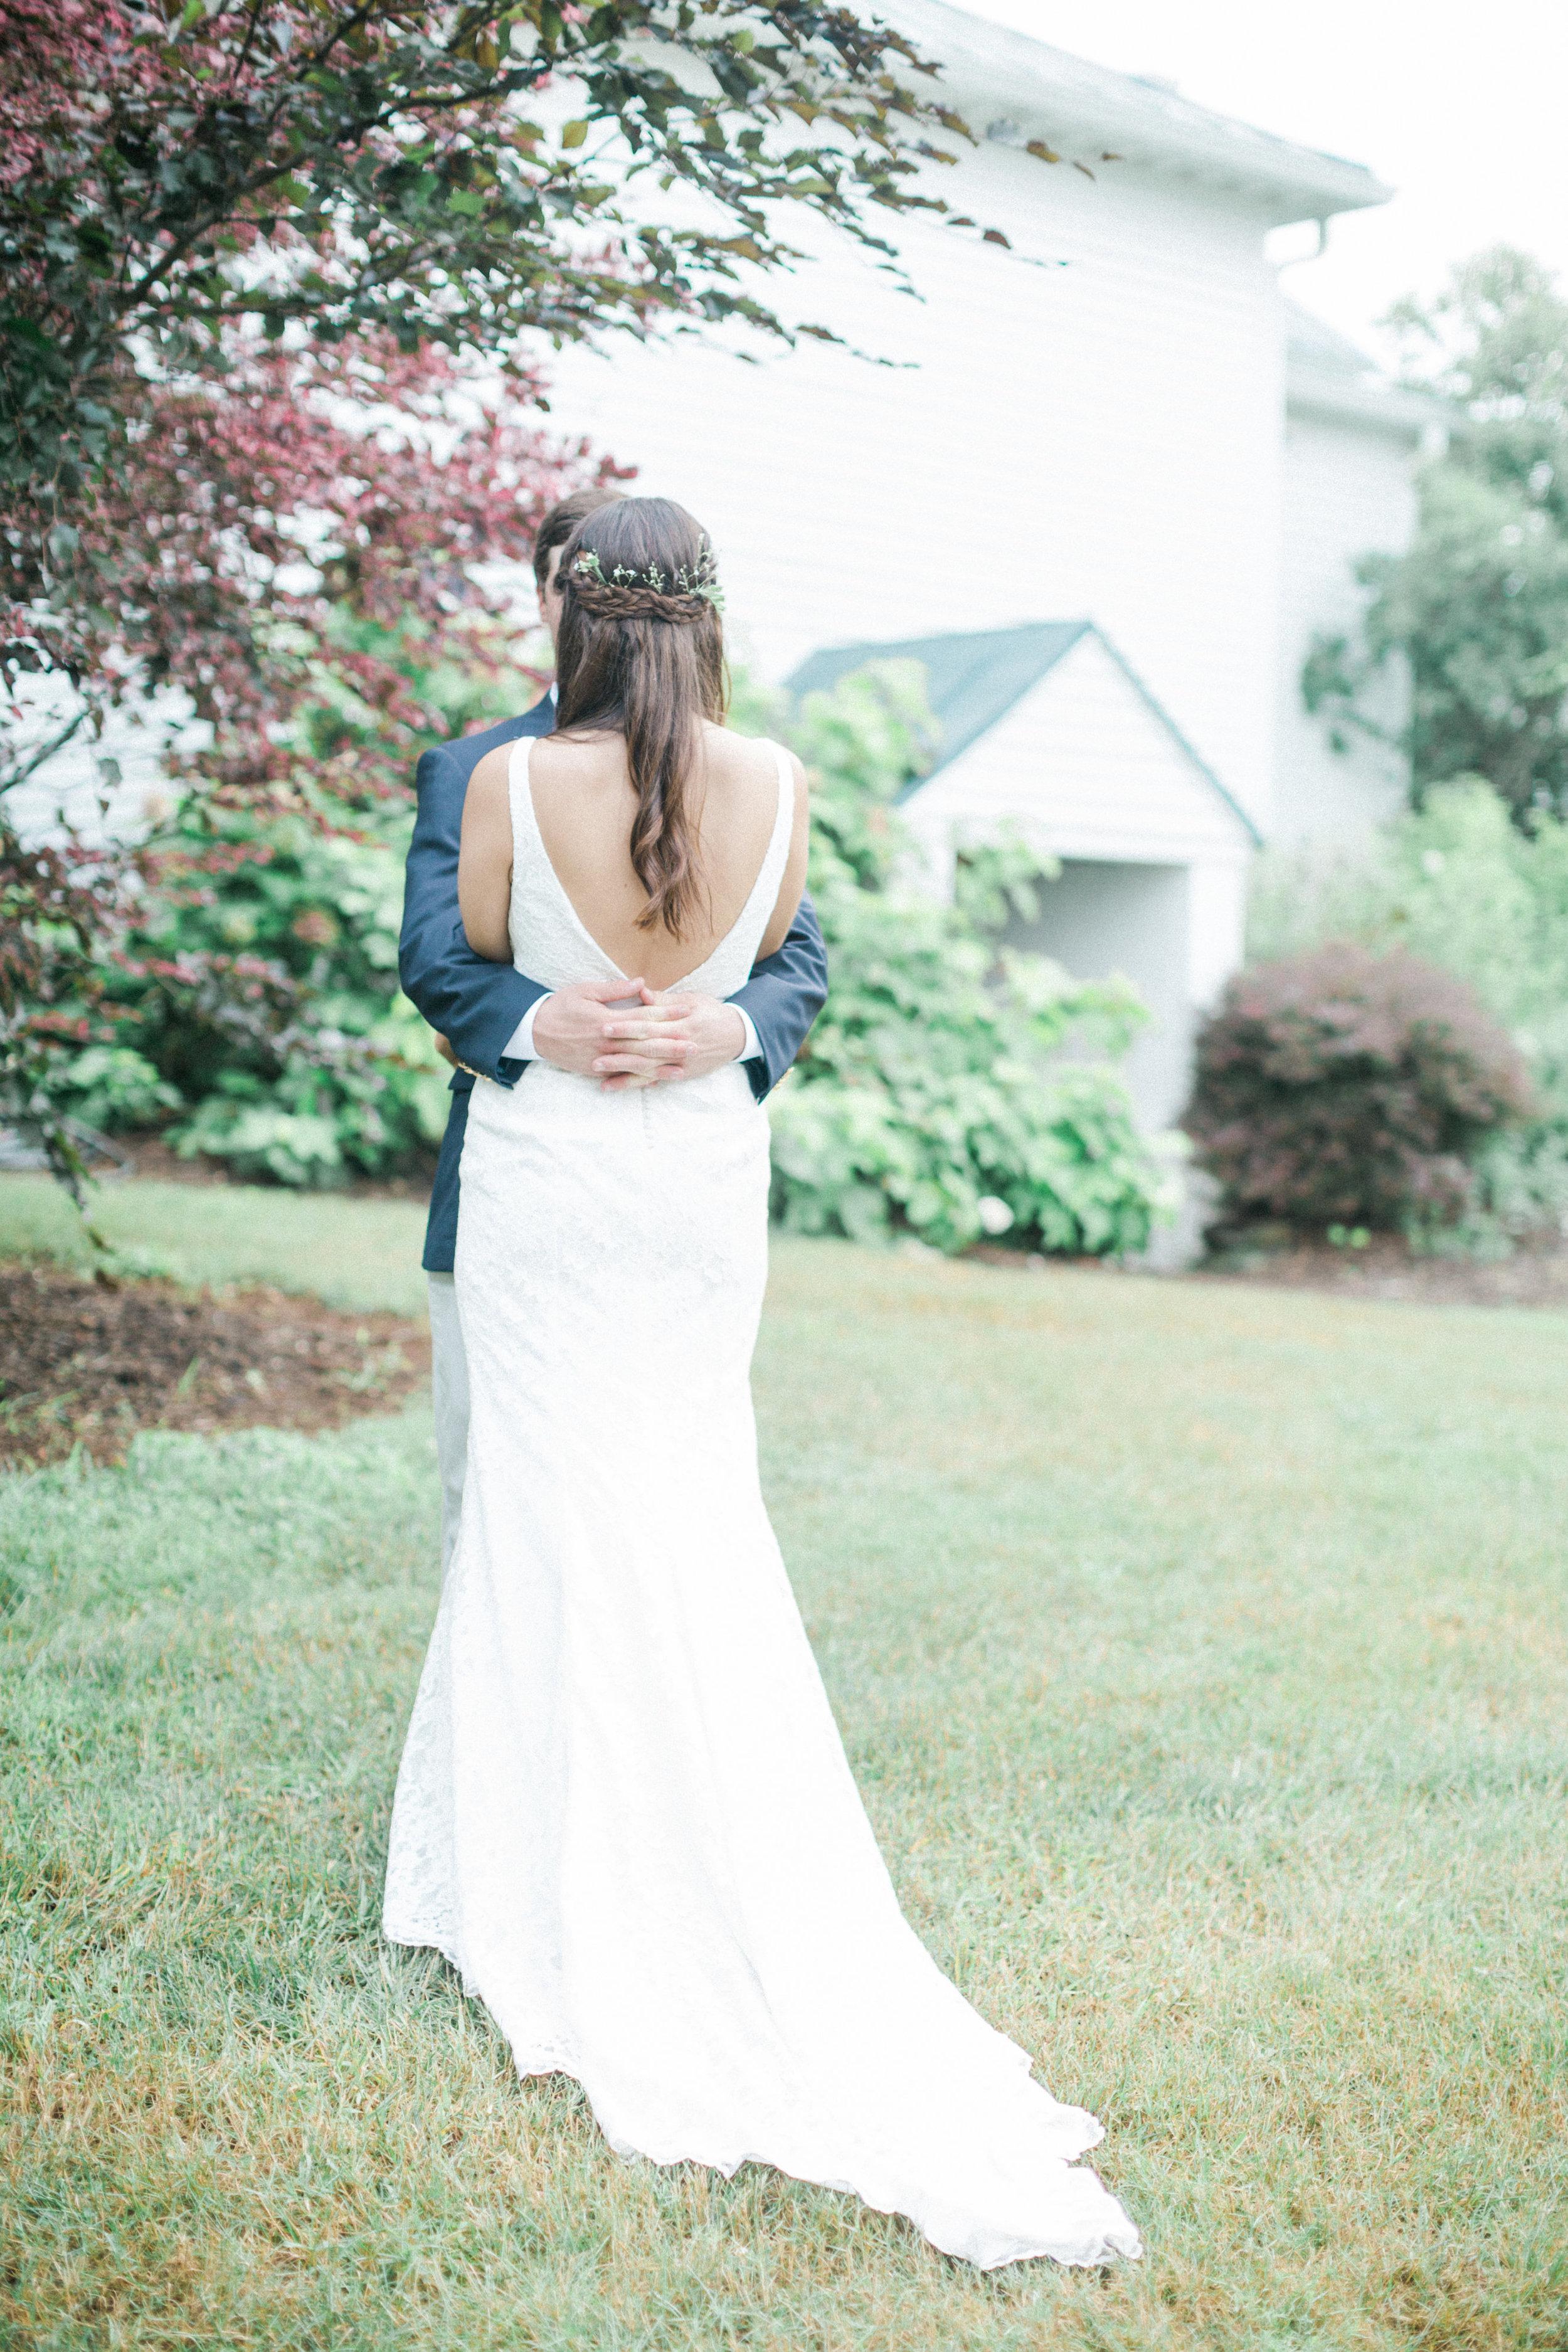 062715-Hannah+Drew-pharsalia-wedding-kathryn-ivy-photography-37.jpg